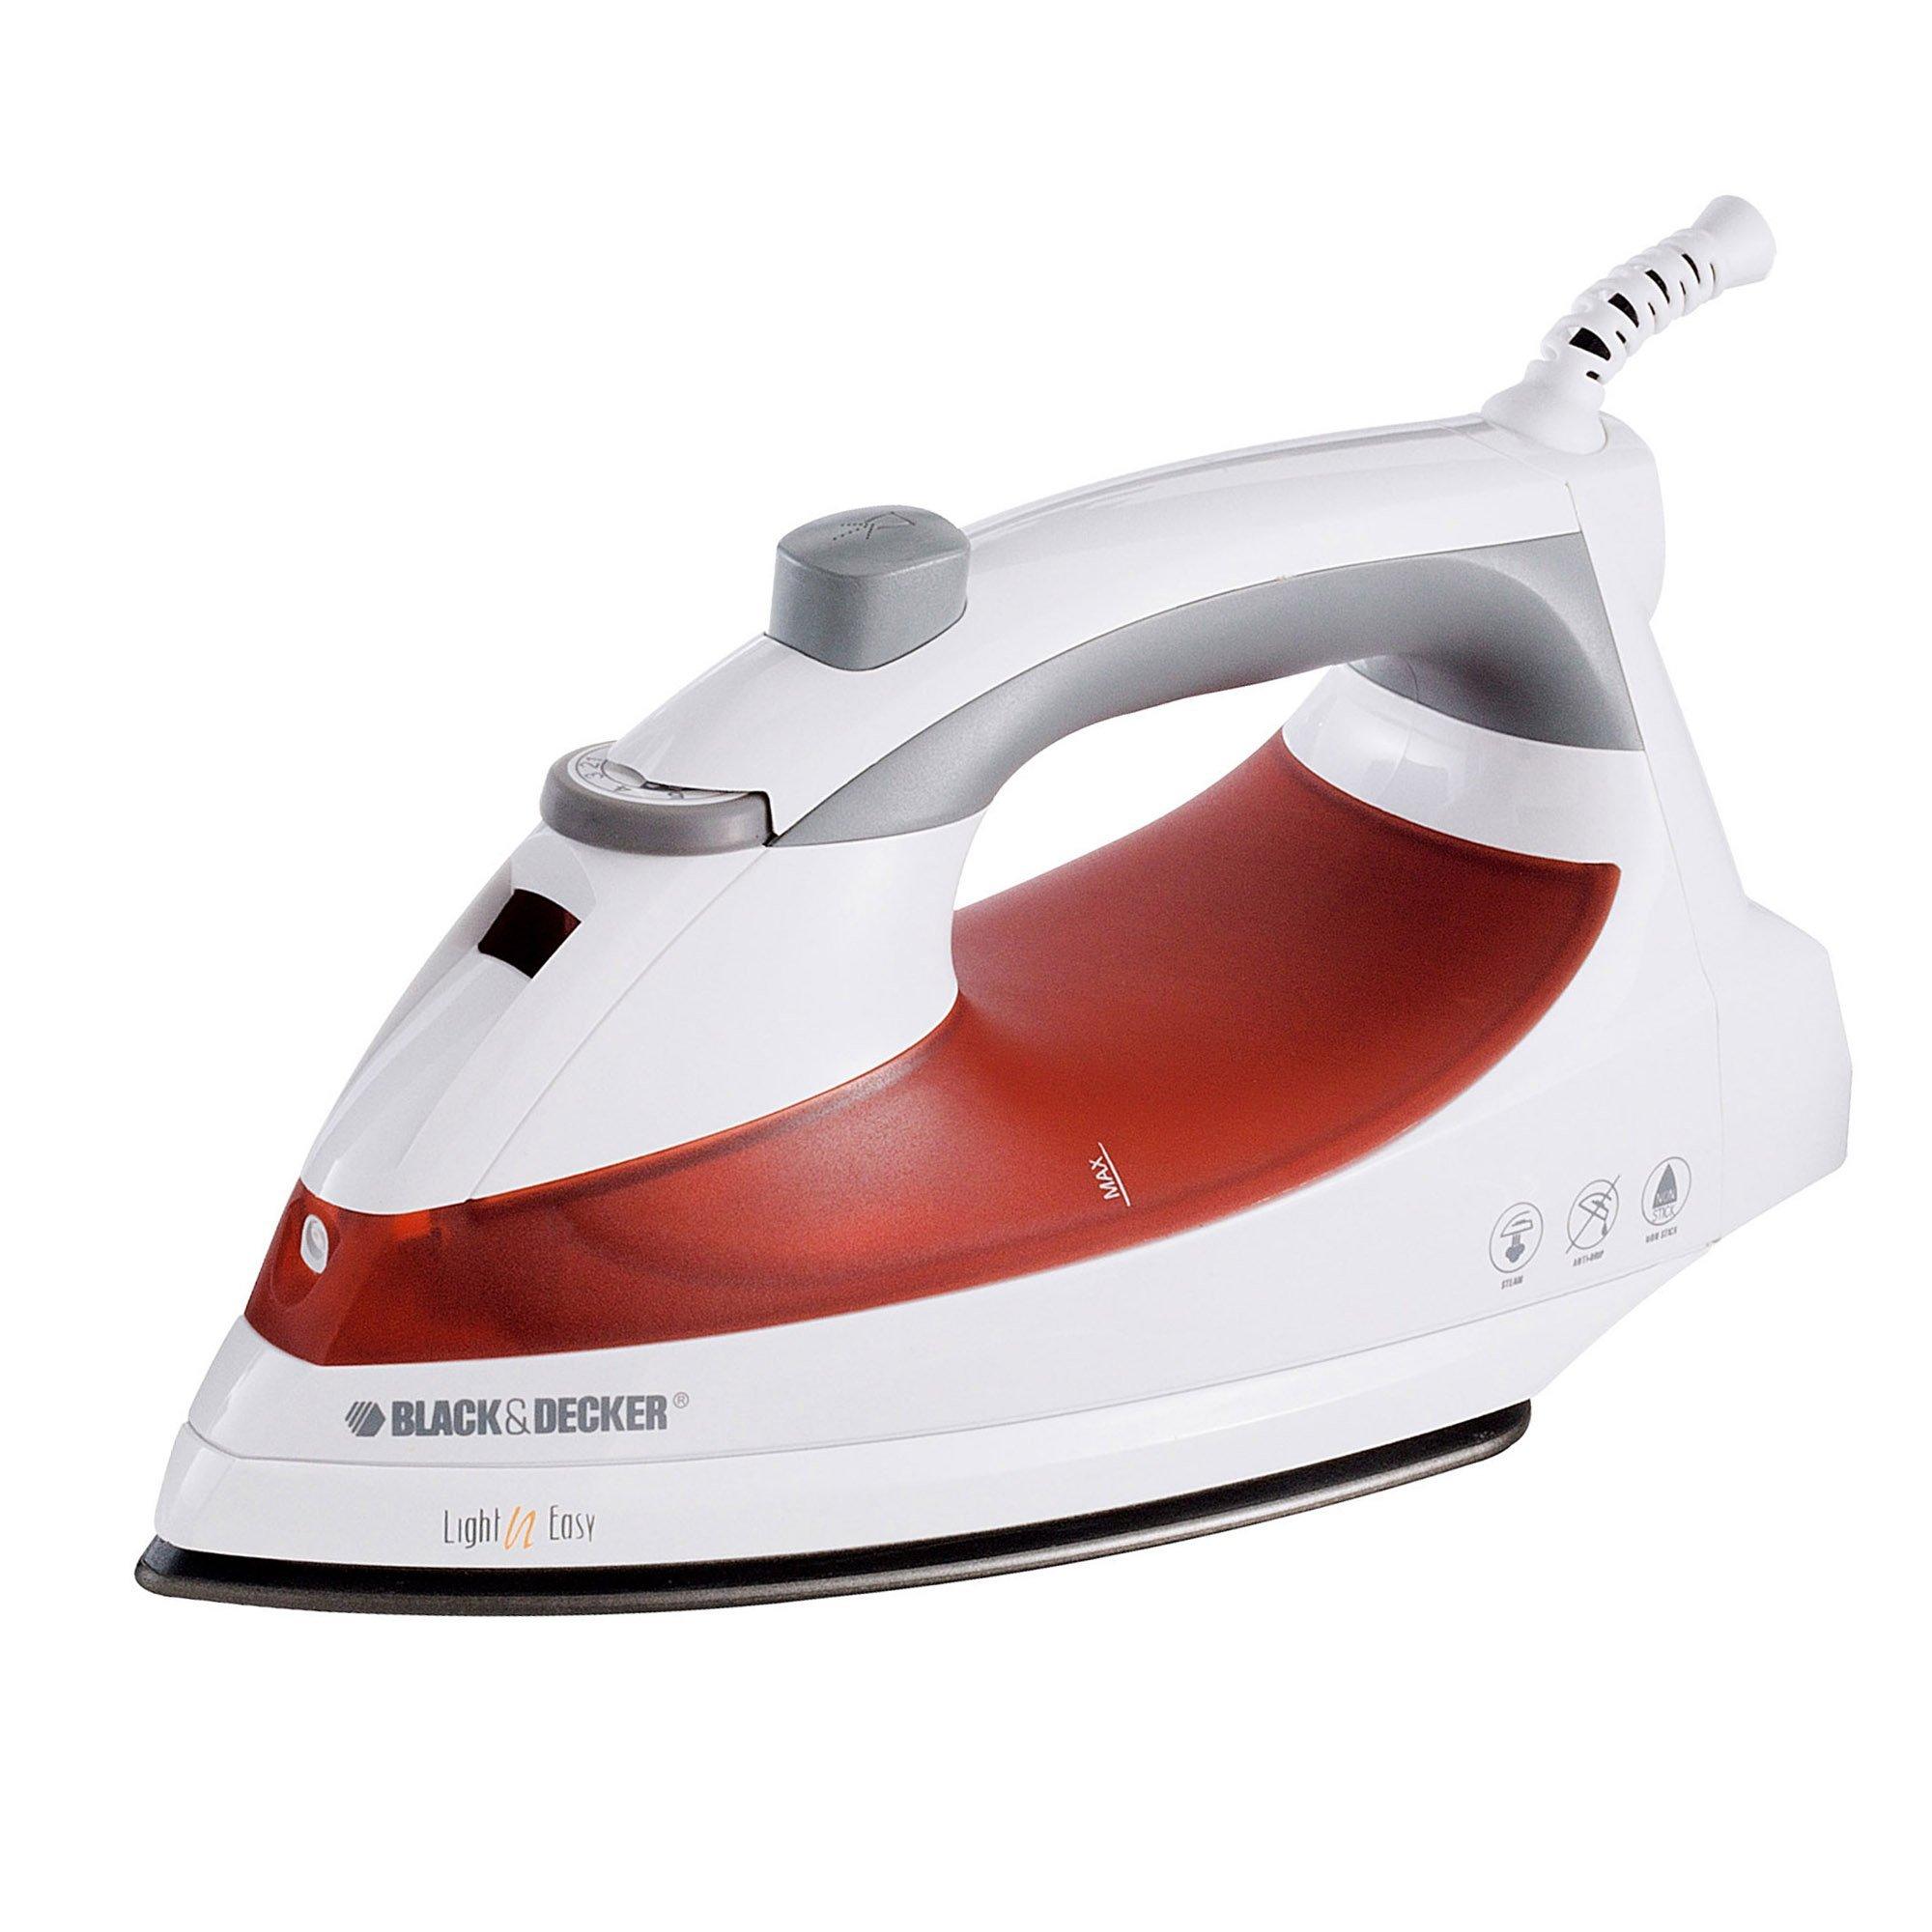 BLACK+DECKER F920 Light 'N Easy Compact Steam Iron, White/Red